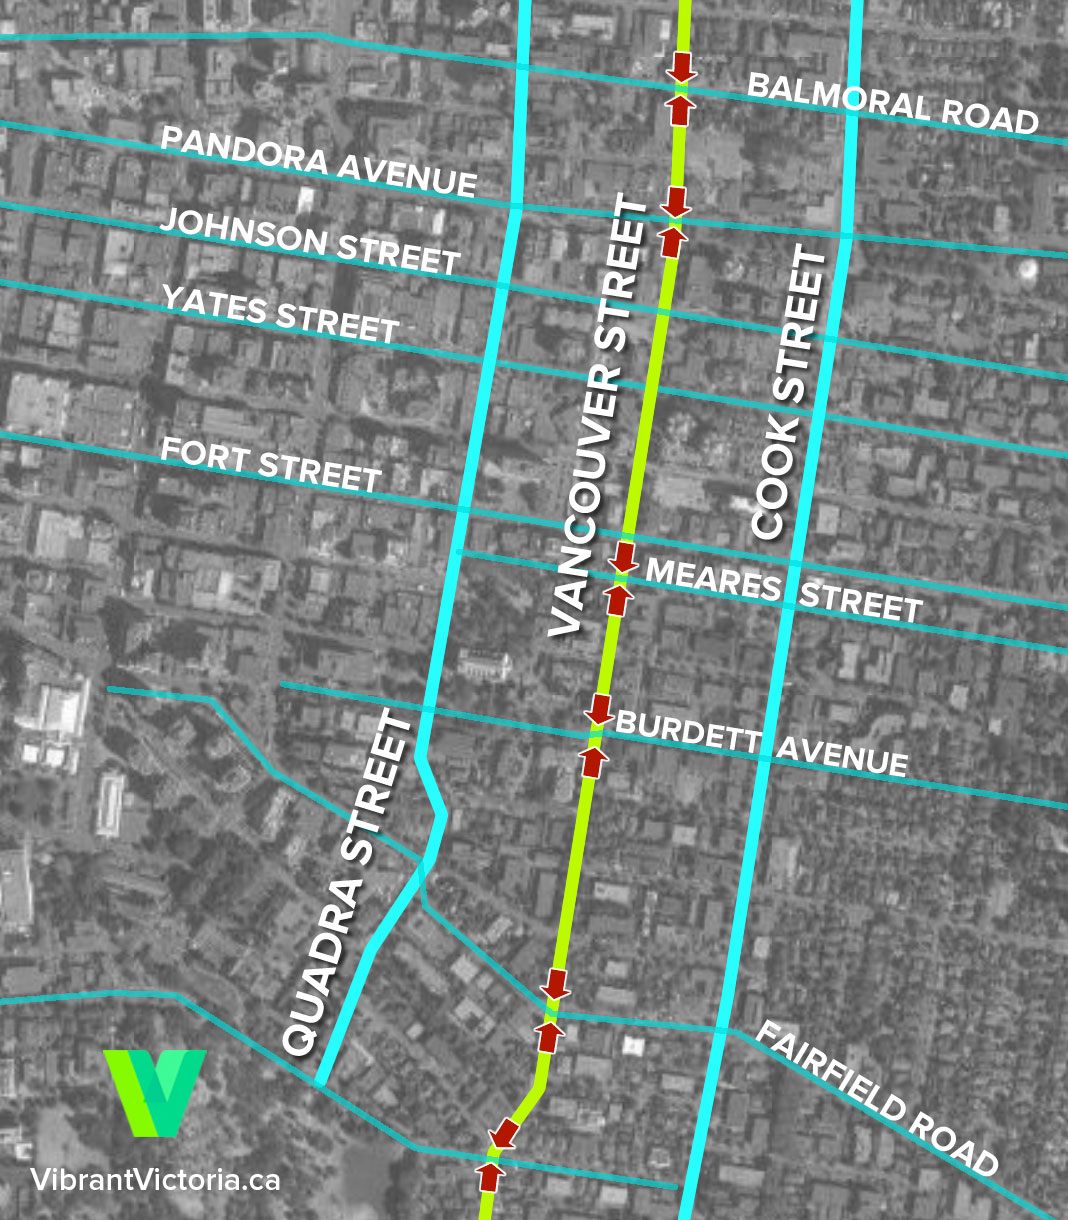 vancouver-street-bike-lane-traffic-diversions.jpg